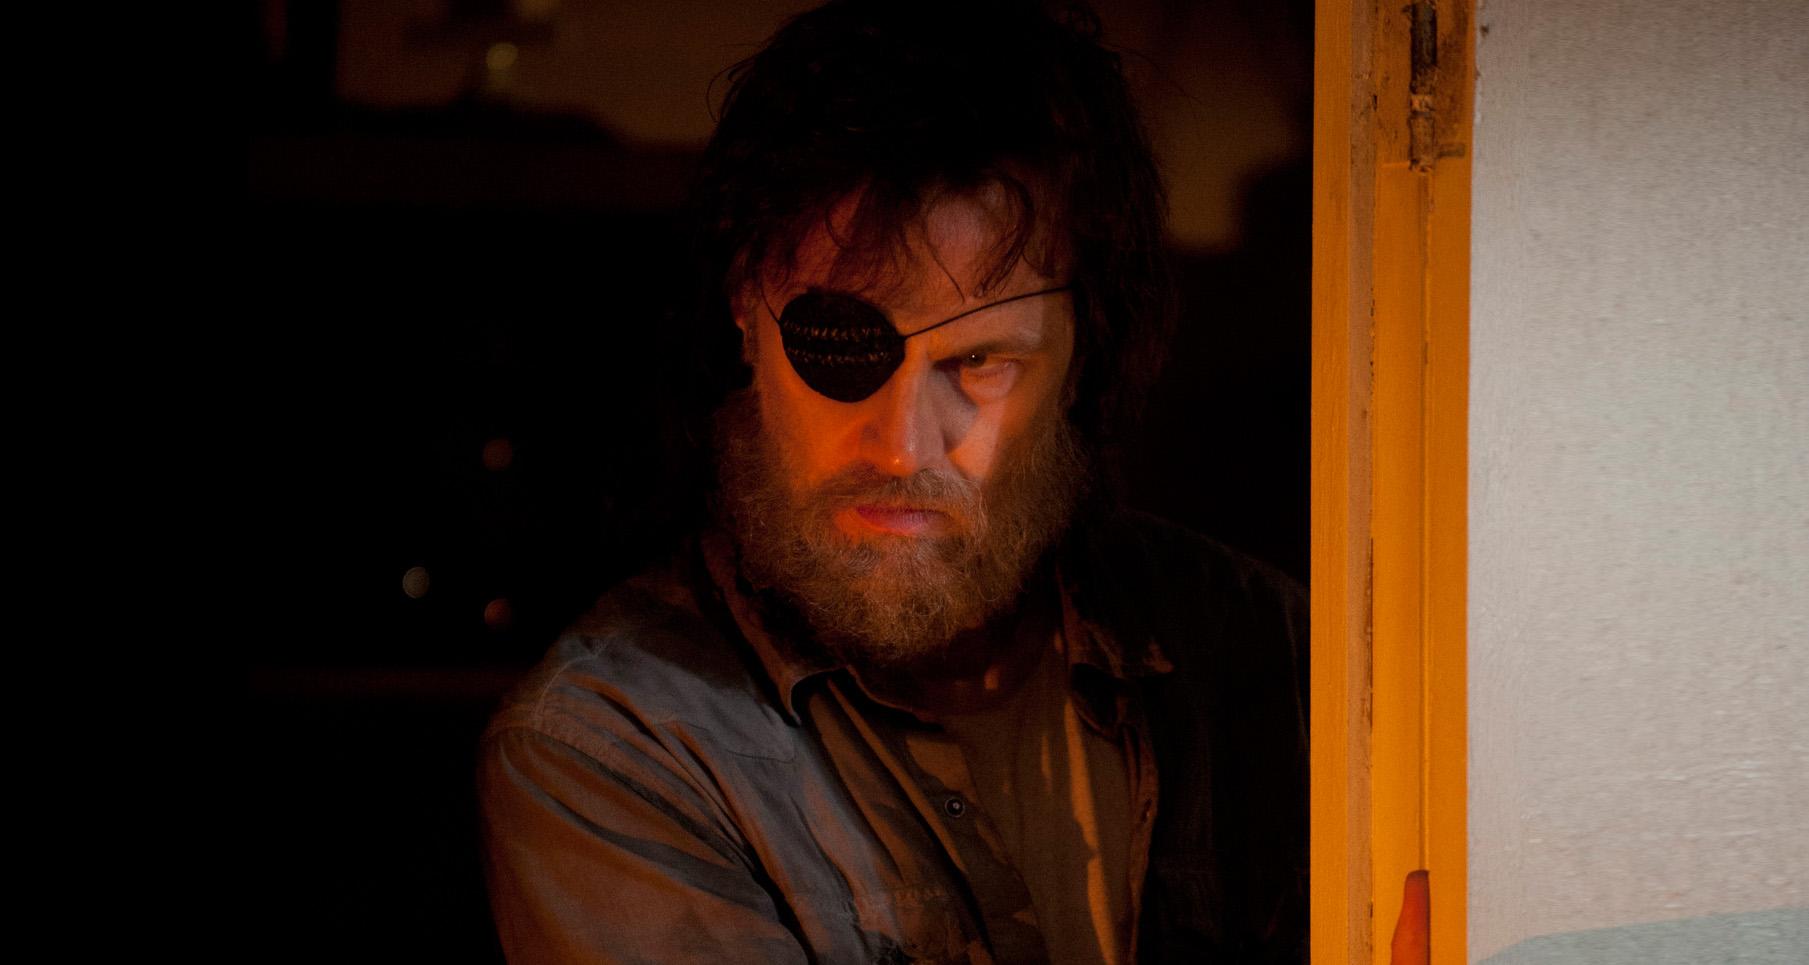 The-Walking-Dead-4-Temporada-S04E06-Live-Bait-0001